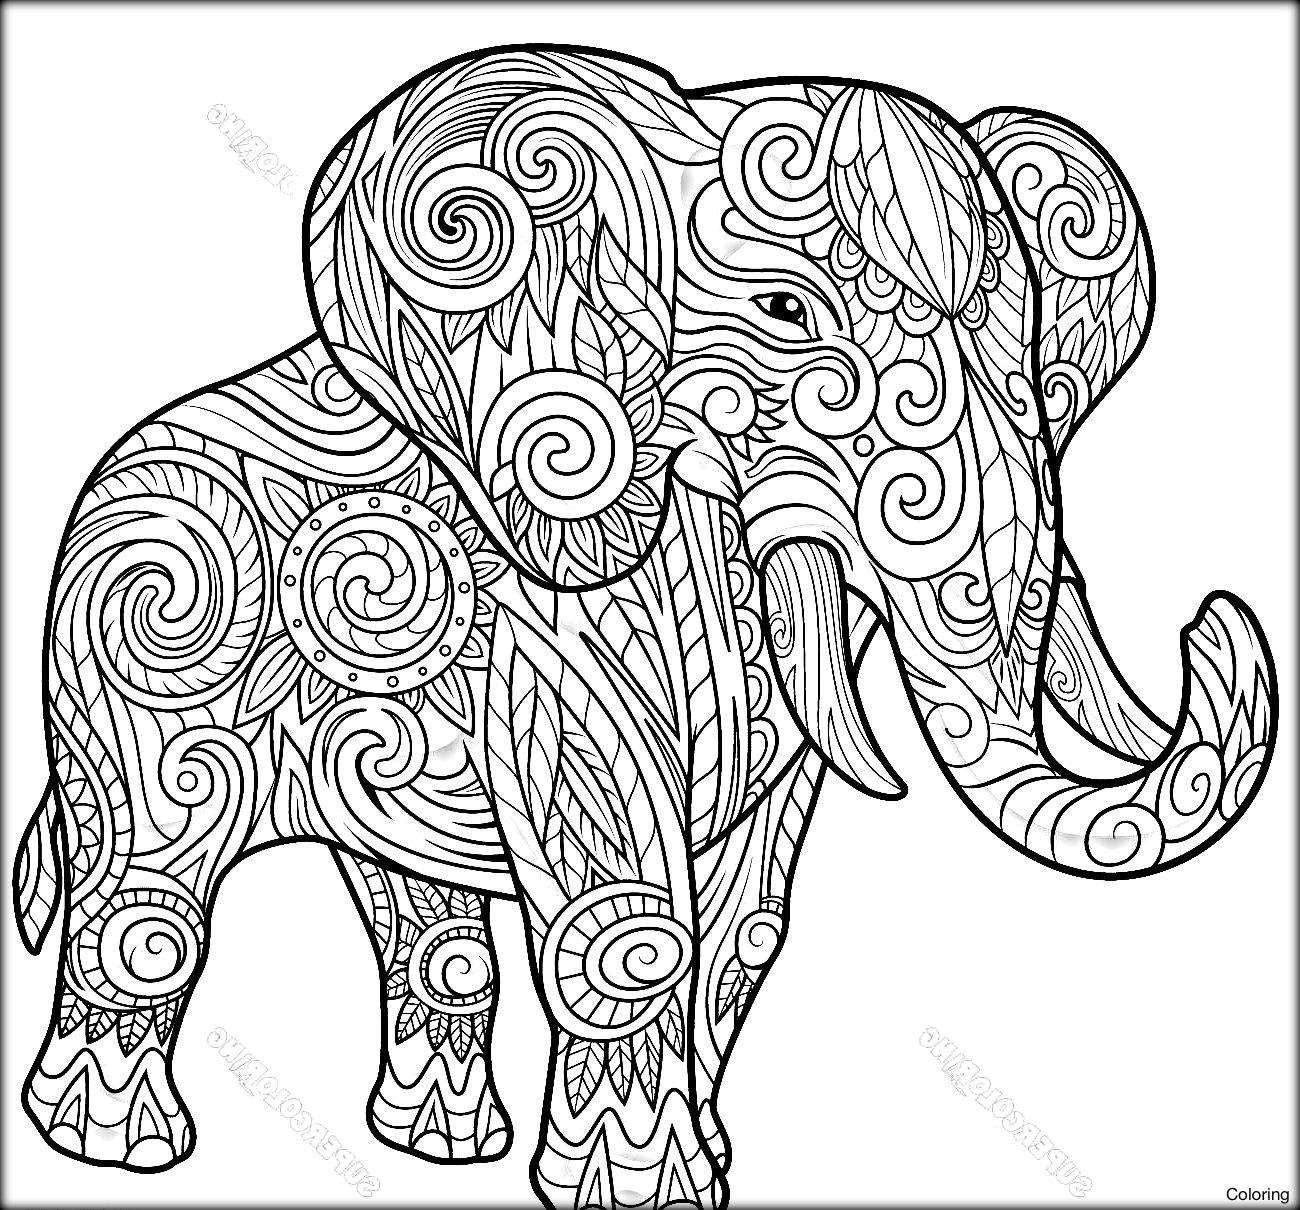 Elephant Mandala Coloring Pages At Getdrawings